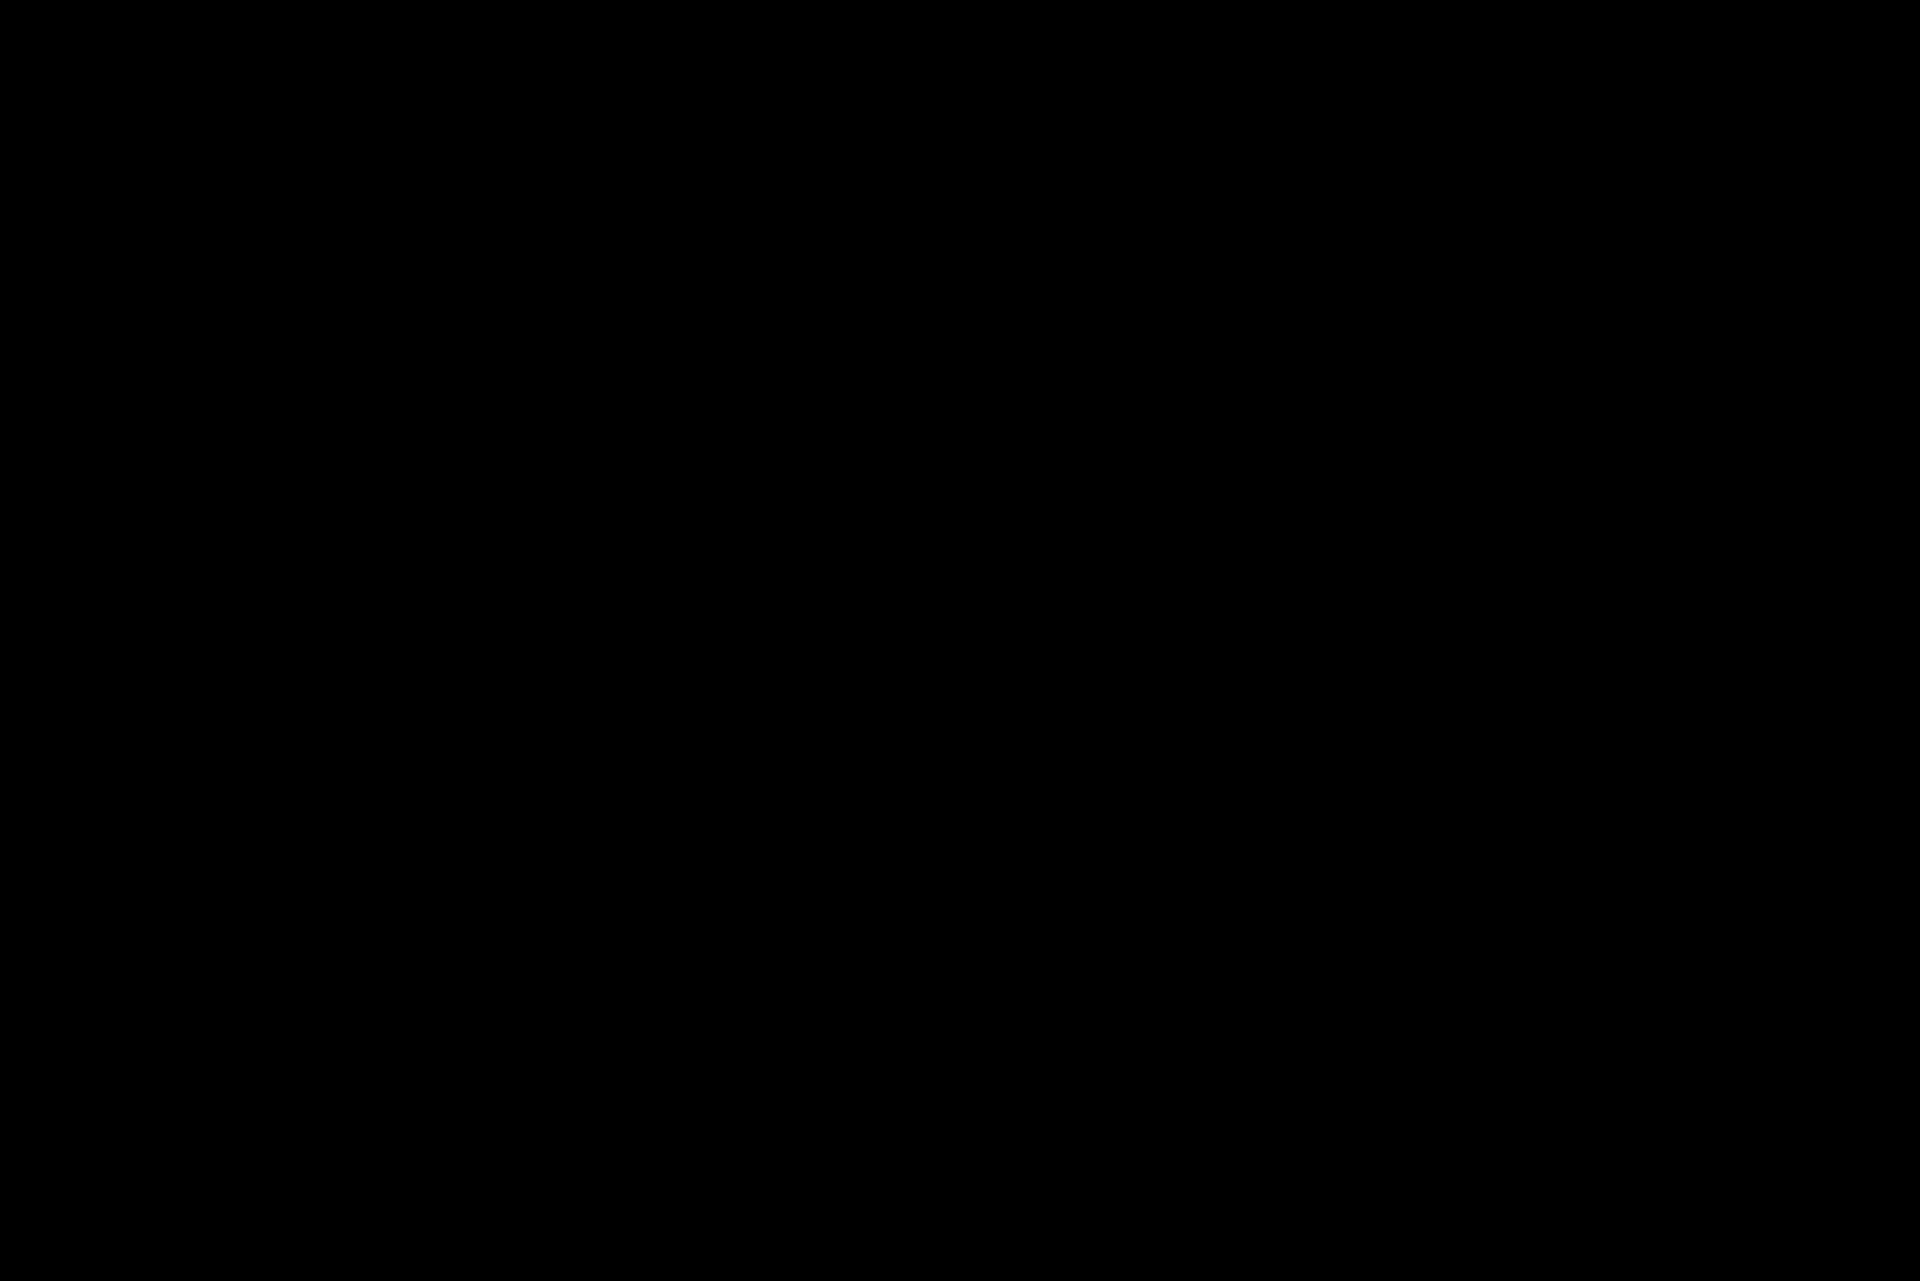 https://eqoxdgod6do.exactdn.com/wp-content/uploads/2021/02/AdobeStock_299897089-scaled.jpeg?strip=all&lossy=1&w=1920&ssl=1